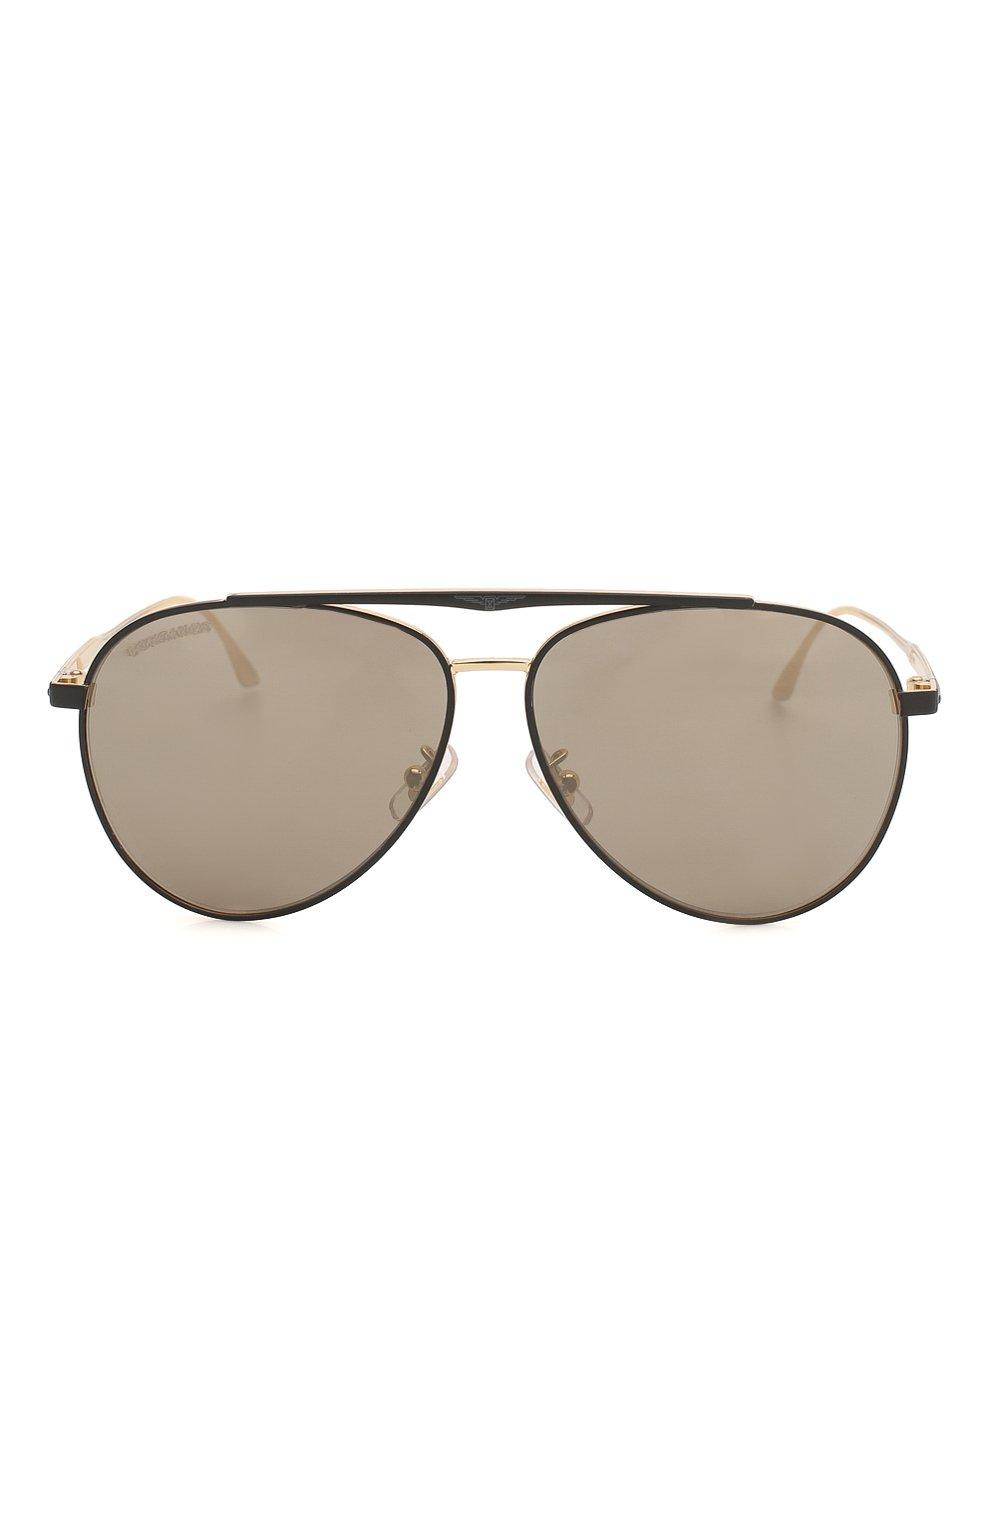 Мужские солнцезащитные очки LONGINES черного цвета, арт. LG0005-H 02L | Фото 3 (Тип очков: С/з; Очки форма: Авиаторы; Оптика Гендер: оптика-мужское)